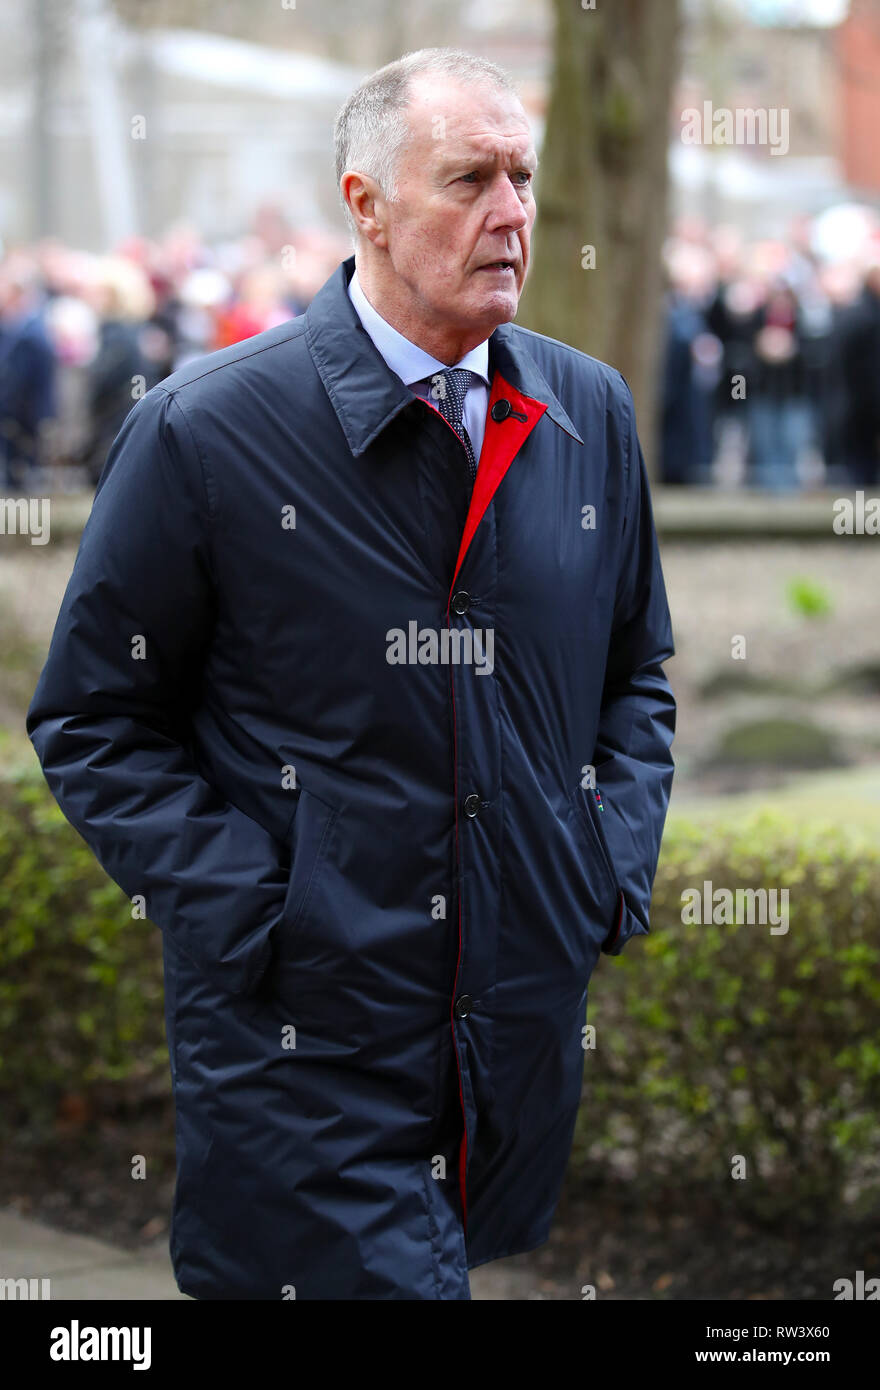 Retired footballer Sir Geoff Hurst arrives at the funeral service for Gordon Banks at Stoke Minster. - Stock Image